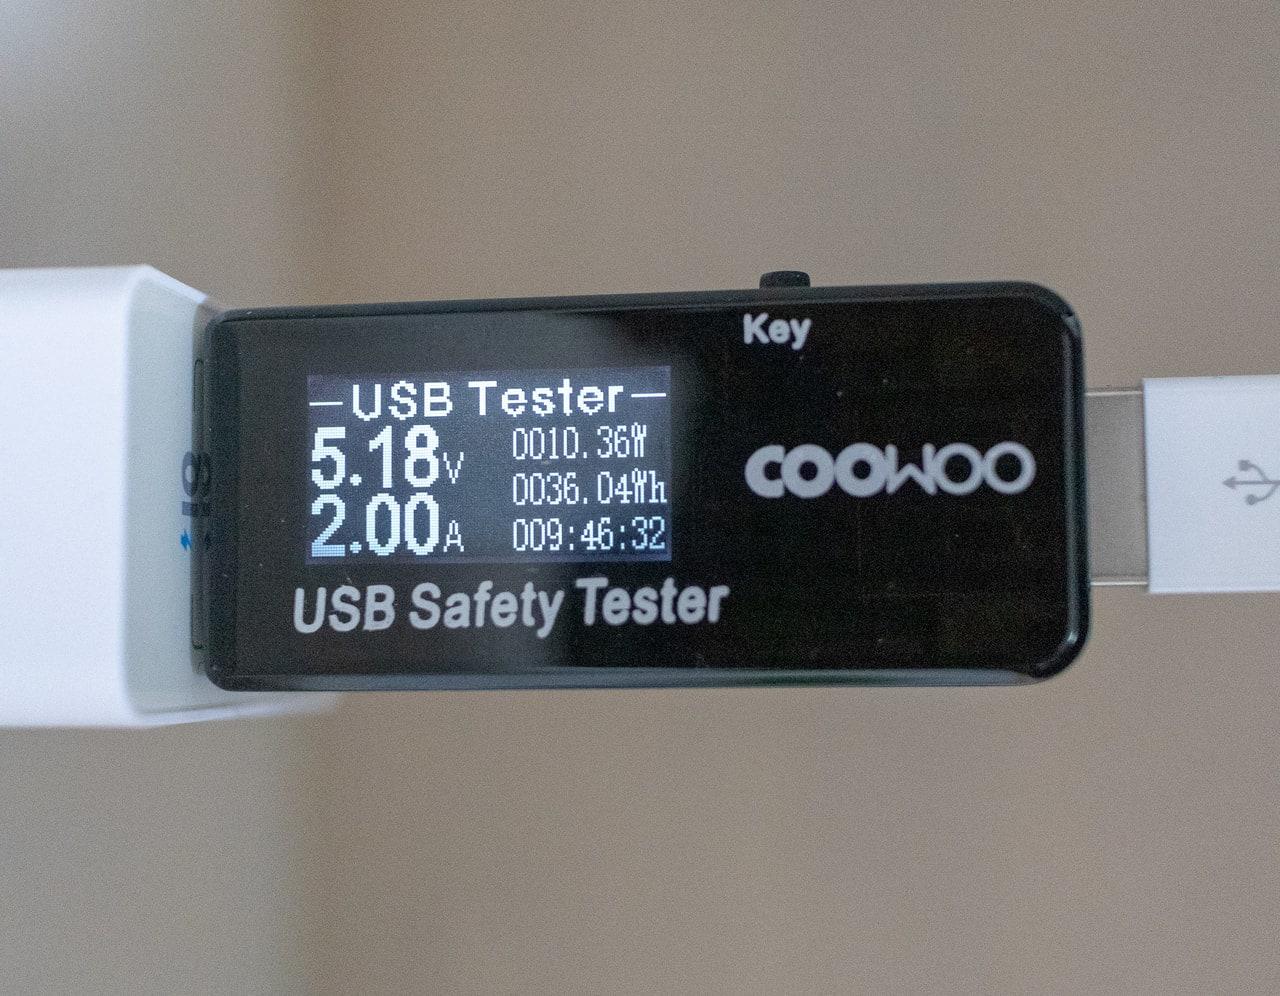 Anker 24W 2ポート USB急速充電器でiPhoneを充電